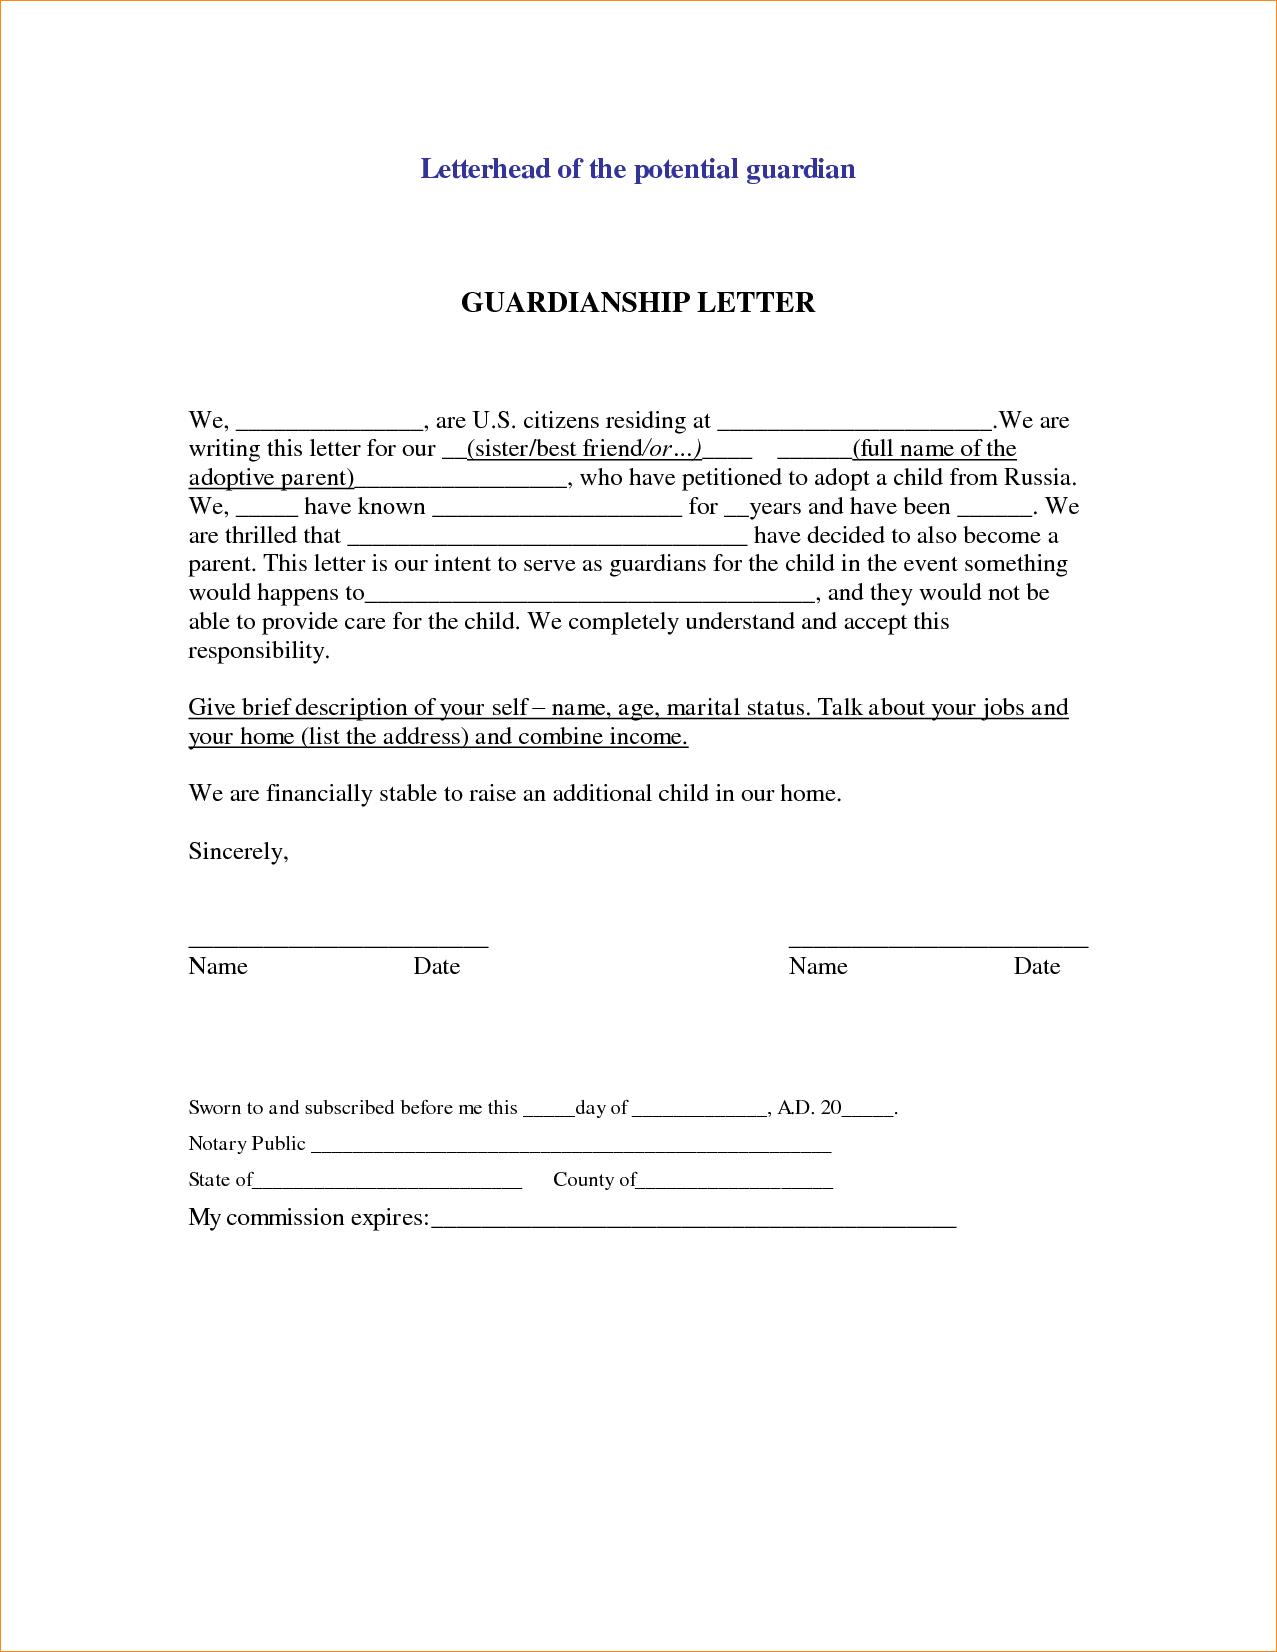 Guardianship Letter Template - Sample Legal Letter Template